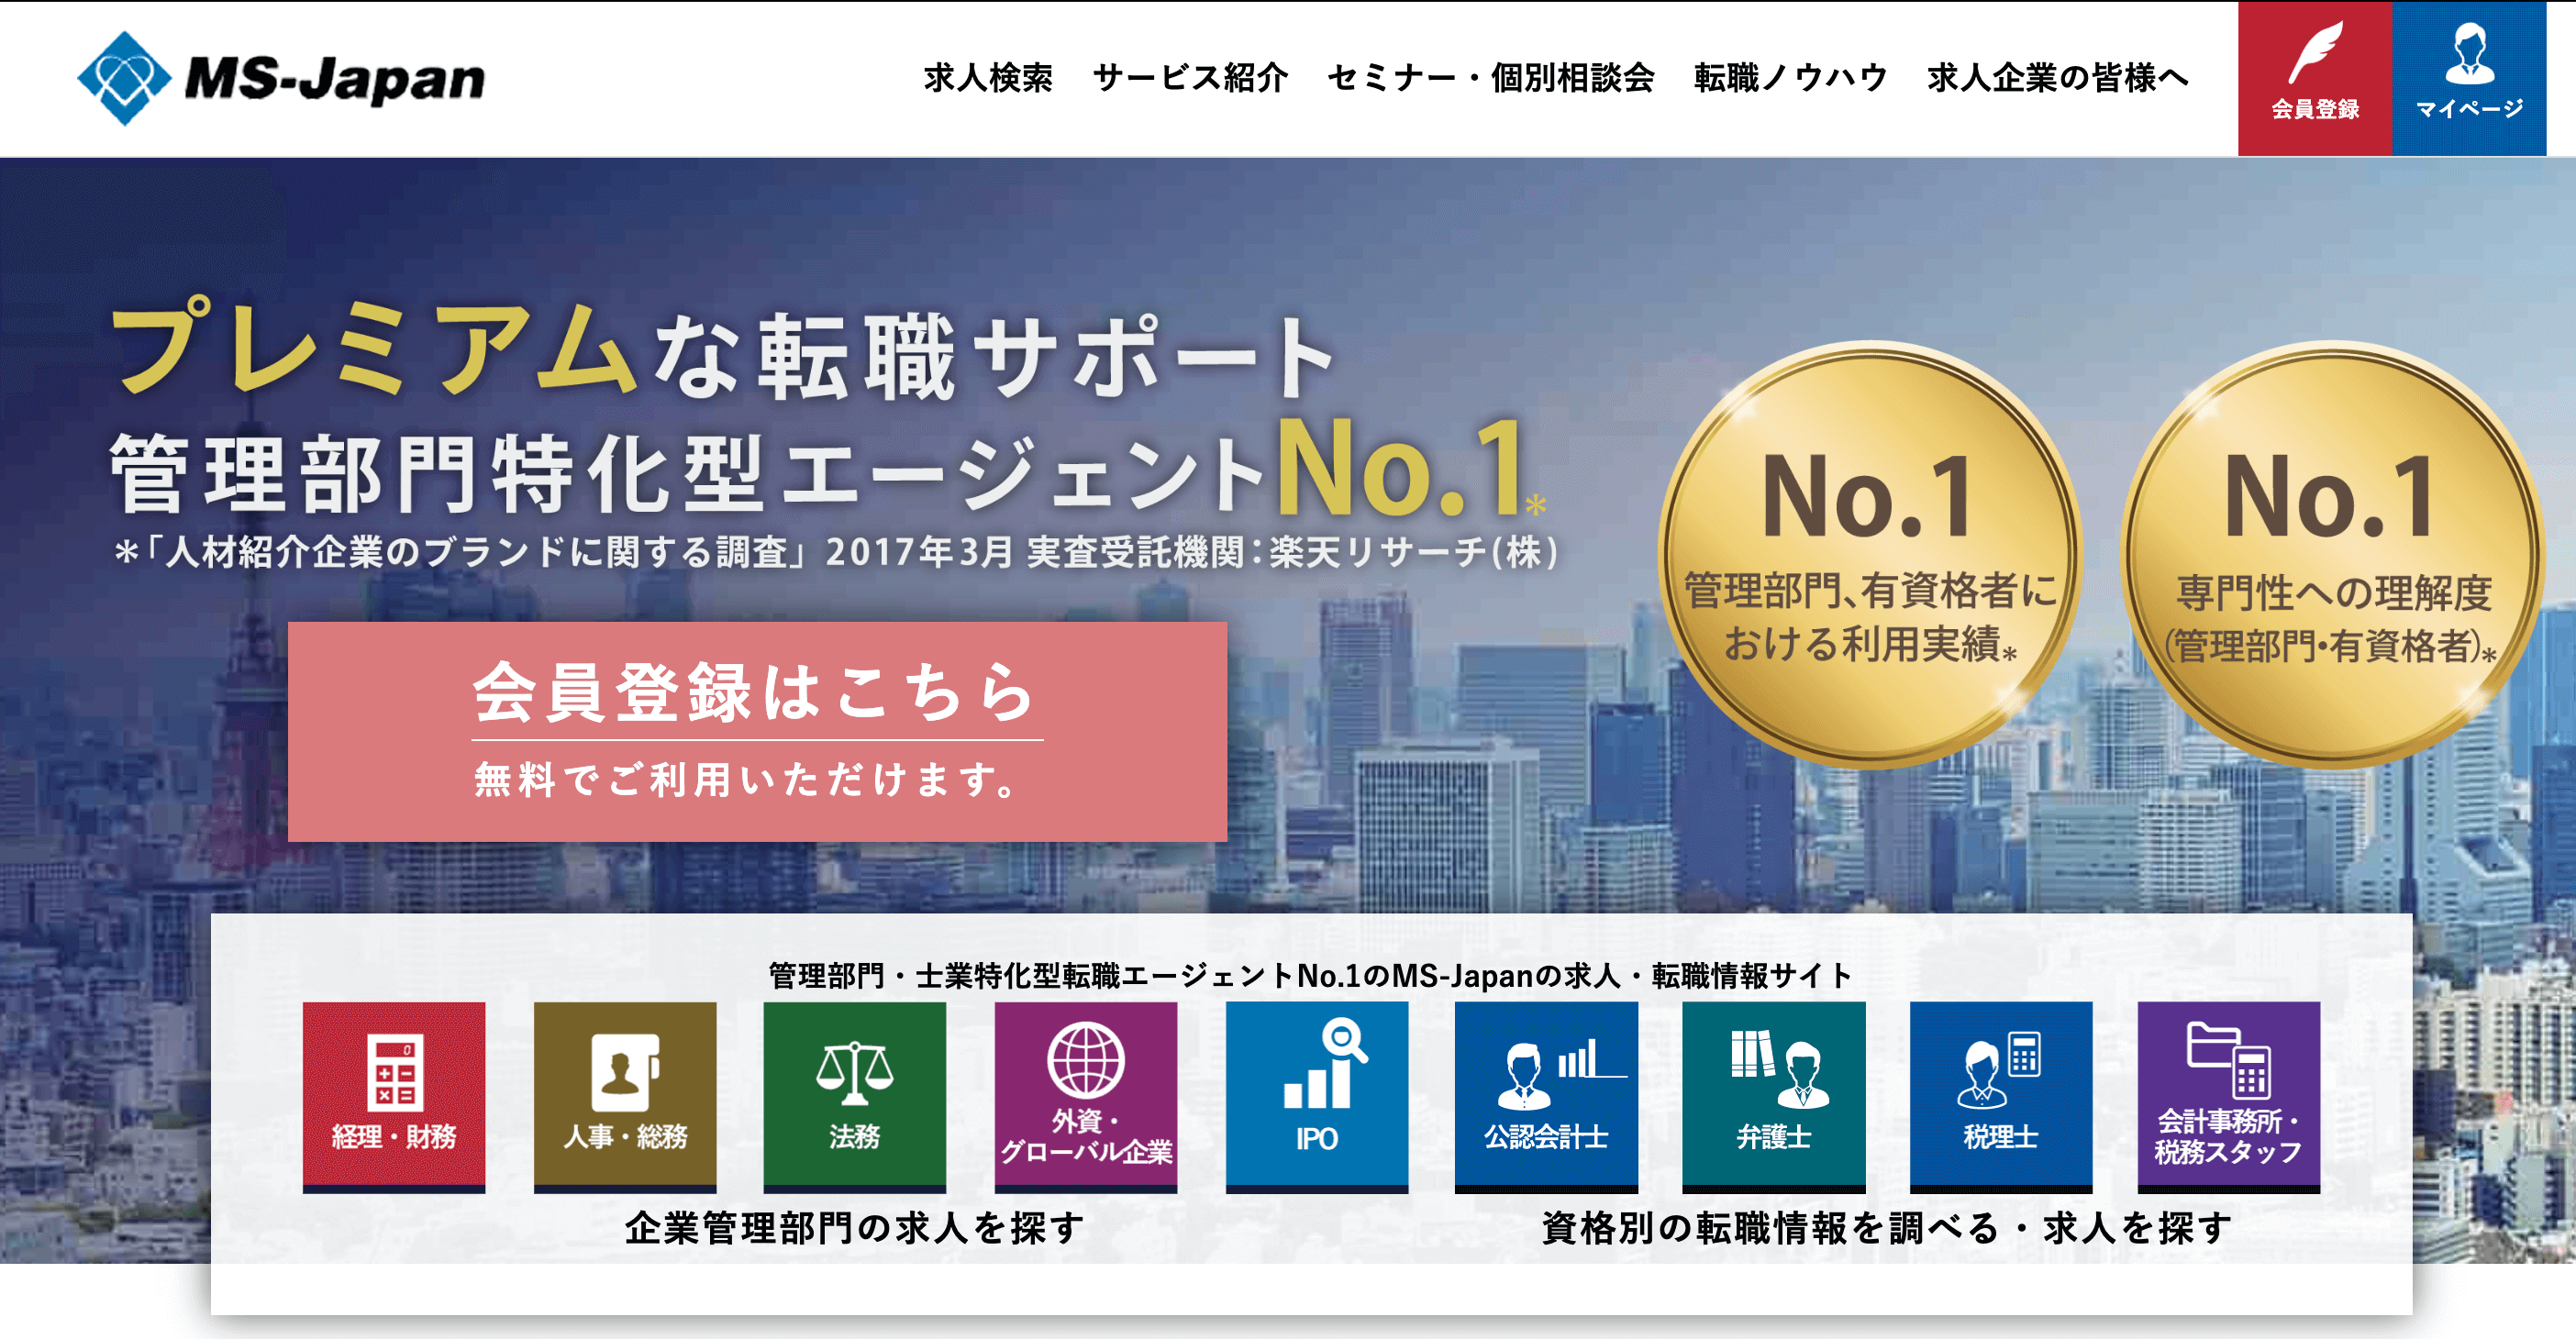 MS-Japanの画像